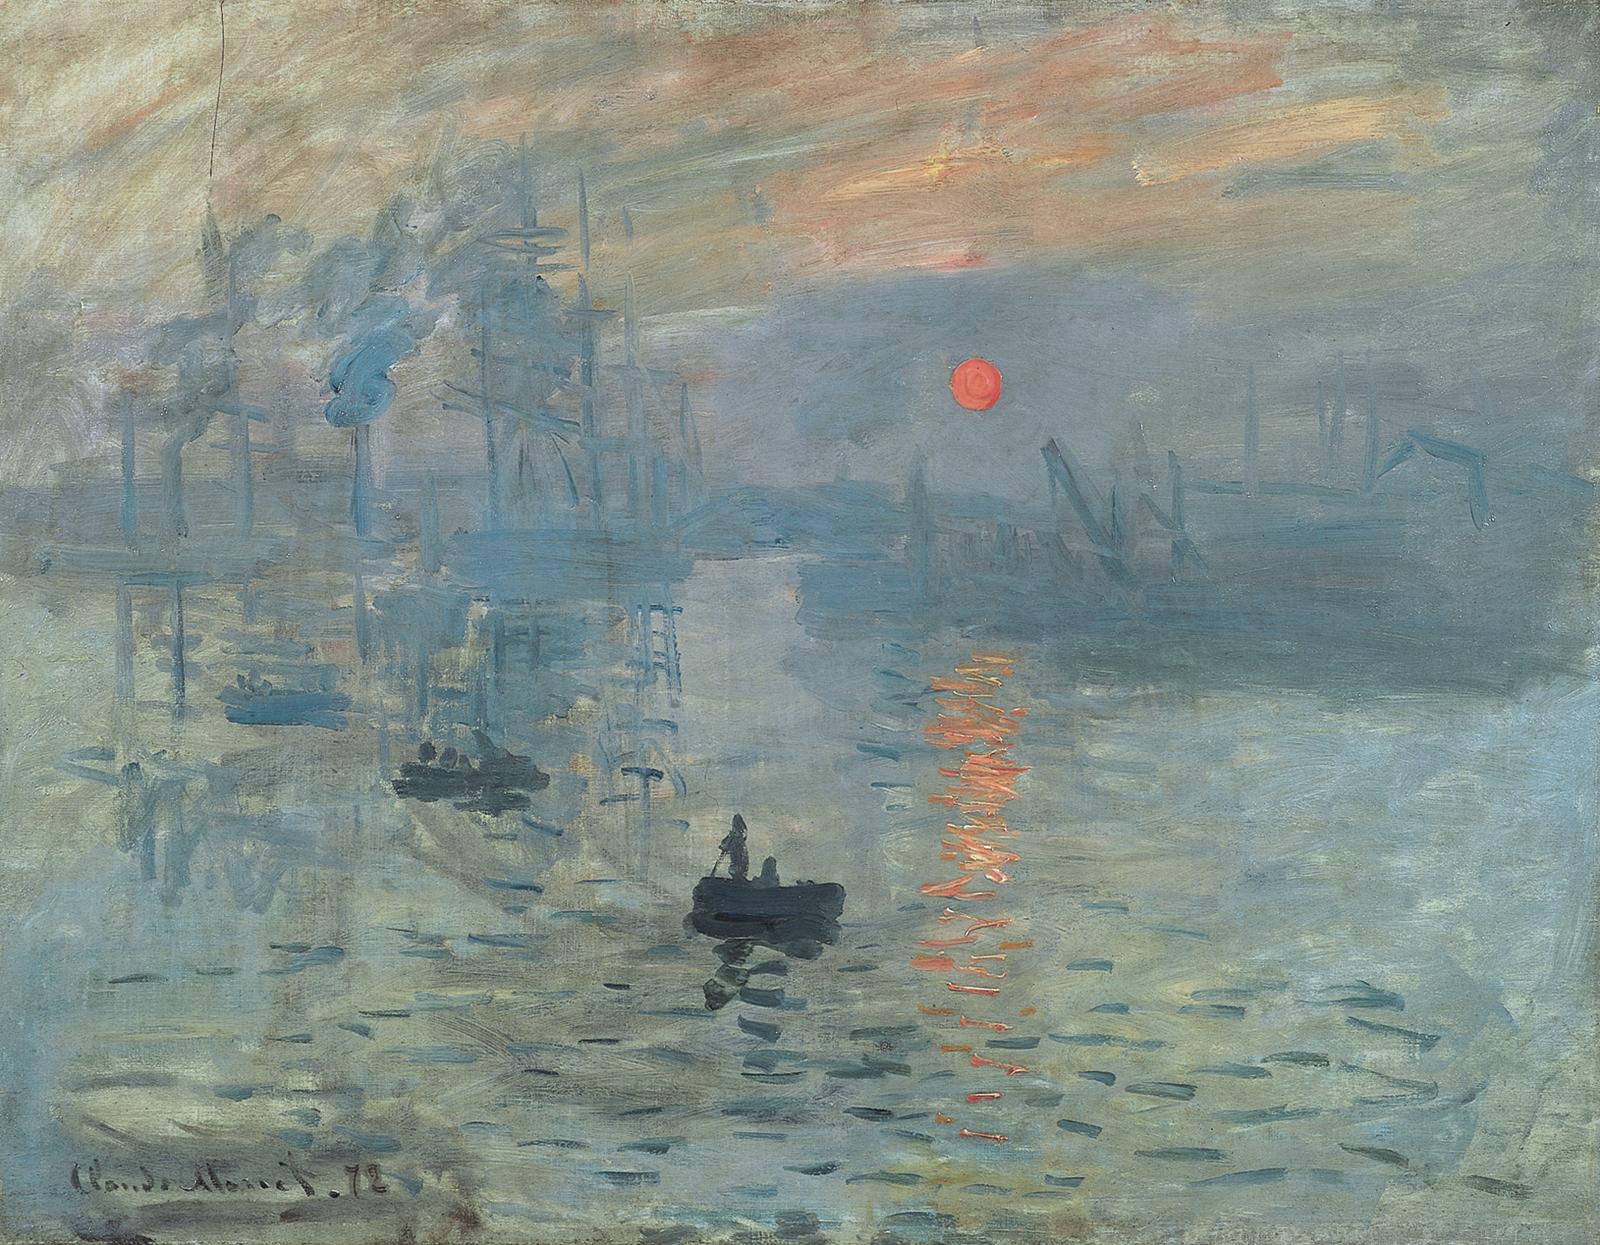 Claude Monet, Impression Sunrise, Oil on Canvas, 1872